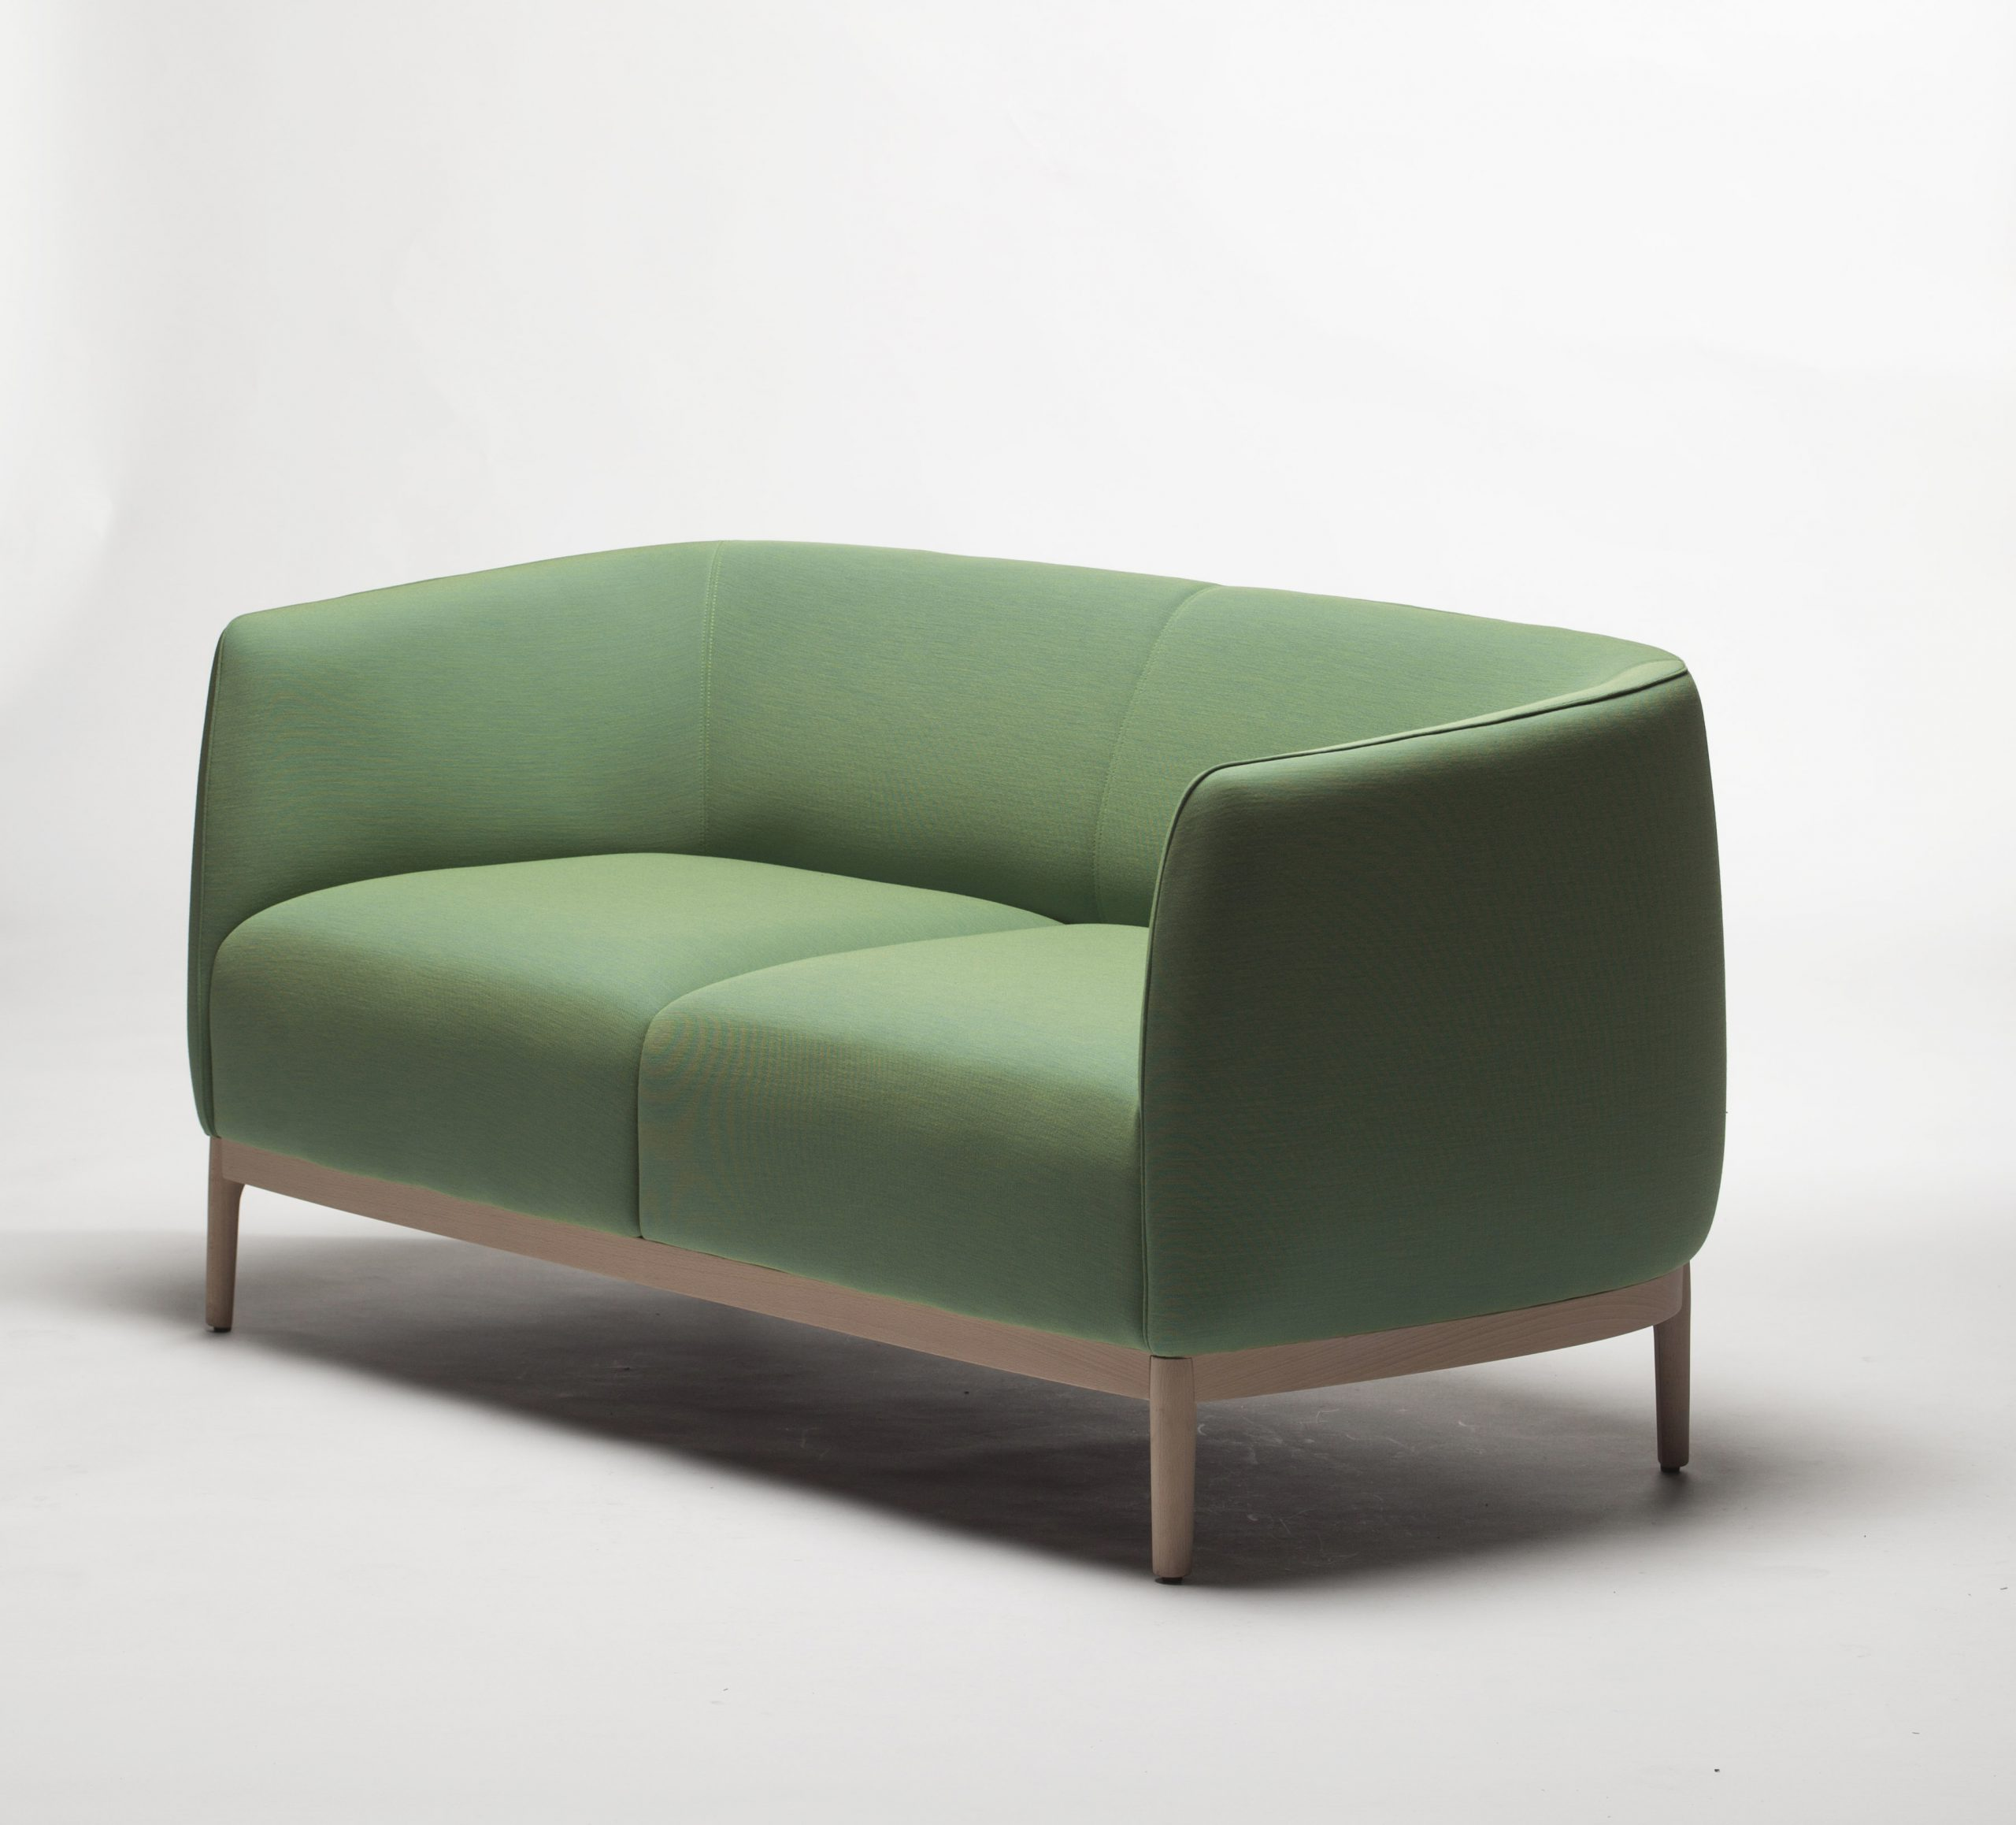 Cape sofa by Debiasi Sandri for Tekhne